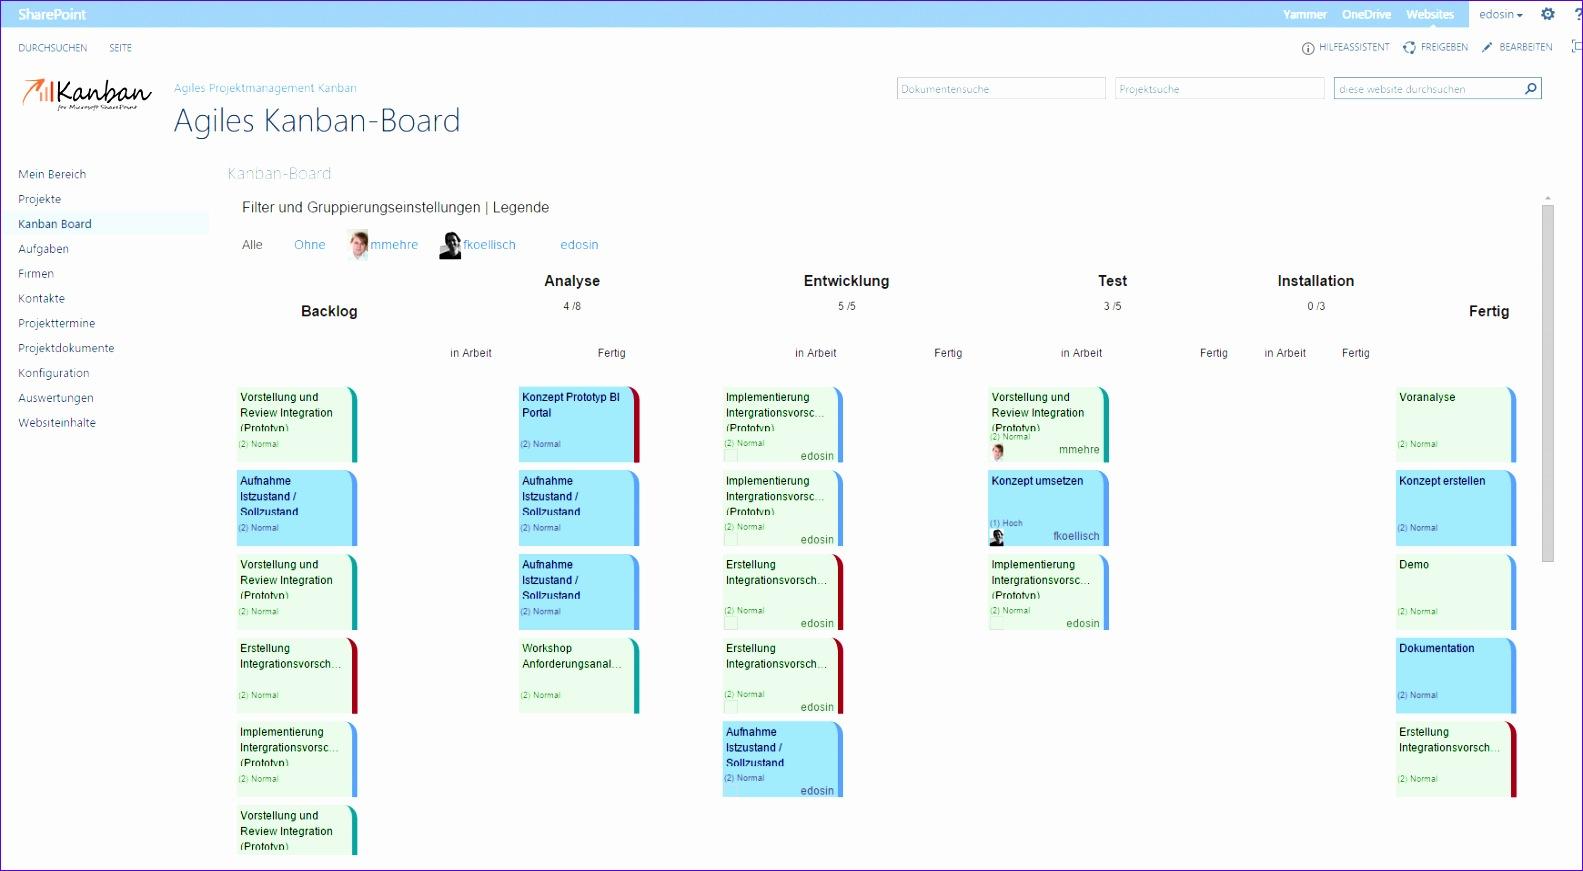 kanban board agiles projektmanagement sharepoint 1583871